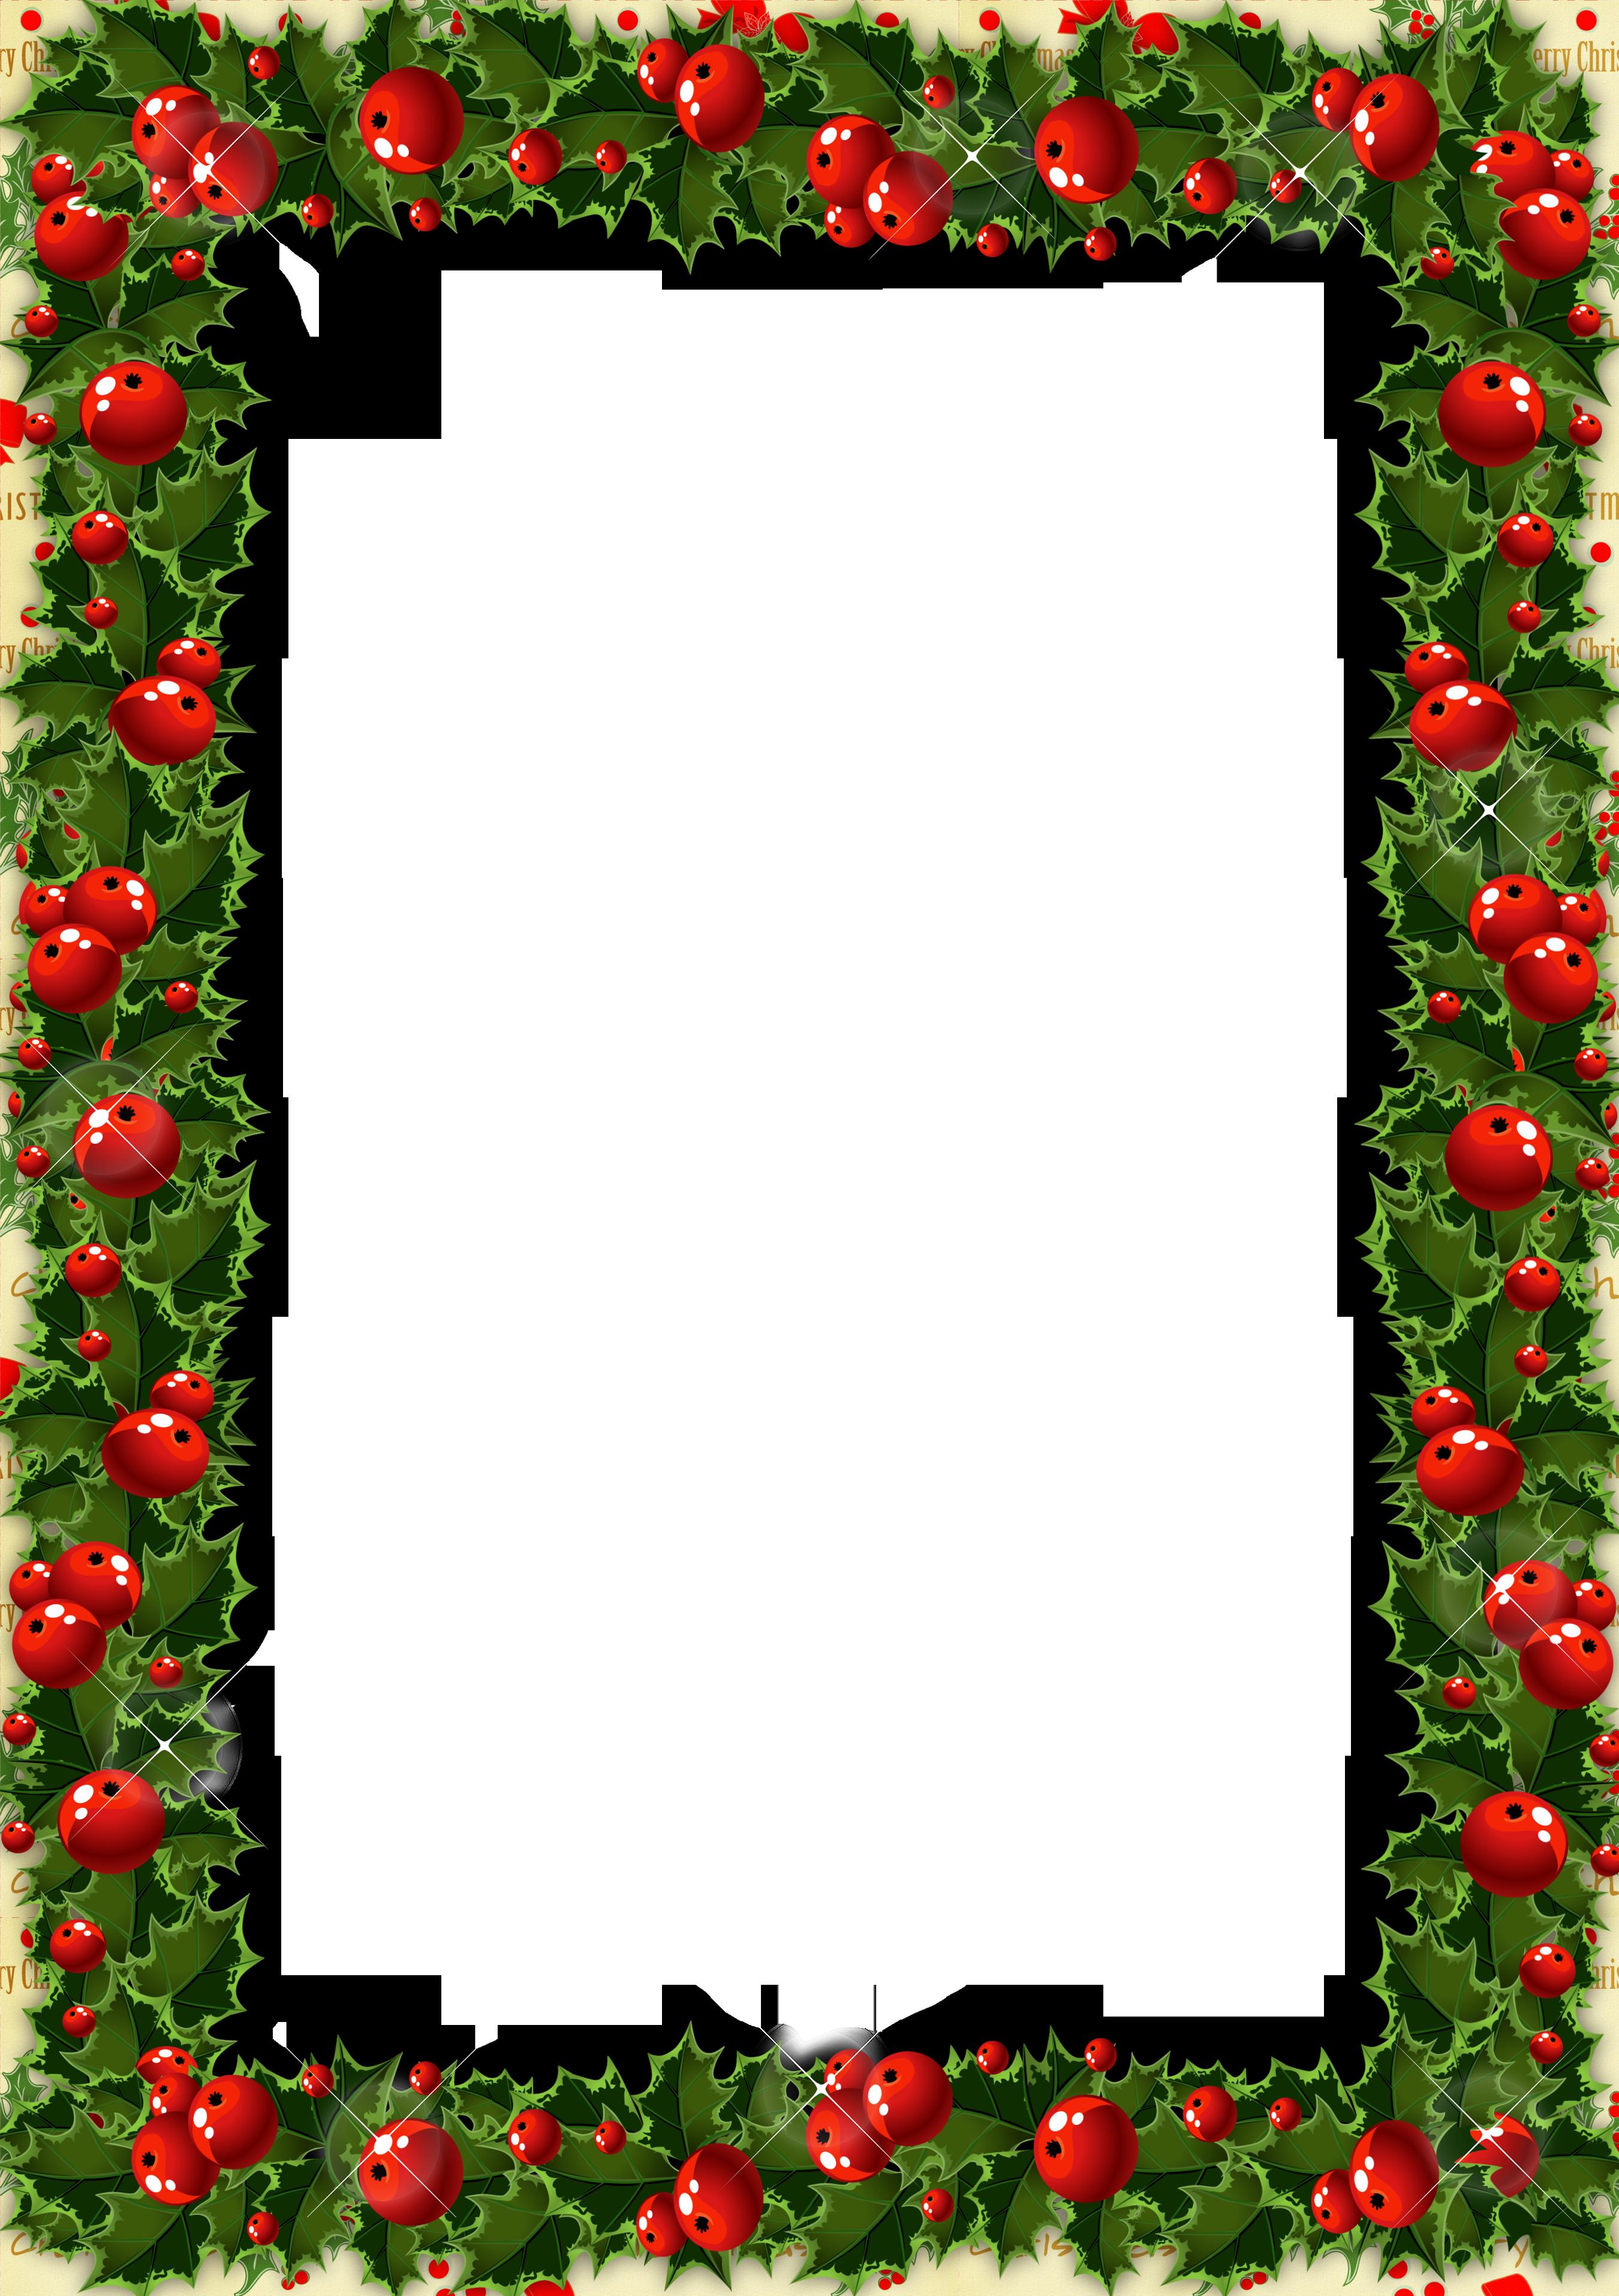 Christmas decorations borders - Transparent Christmas Photo Frame With Mistletoe